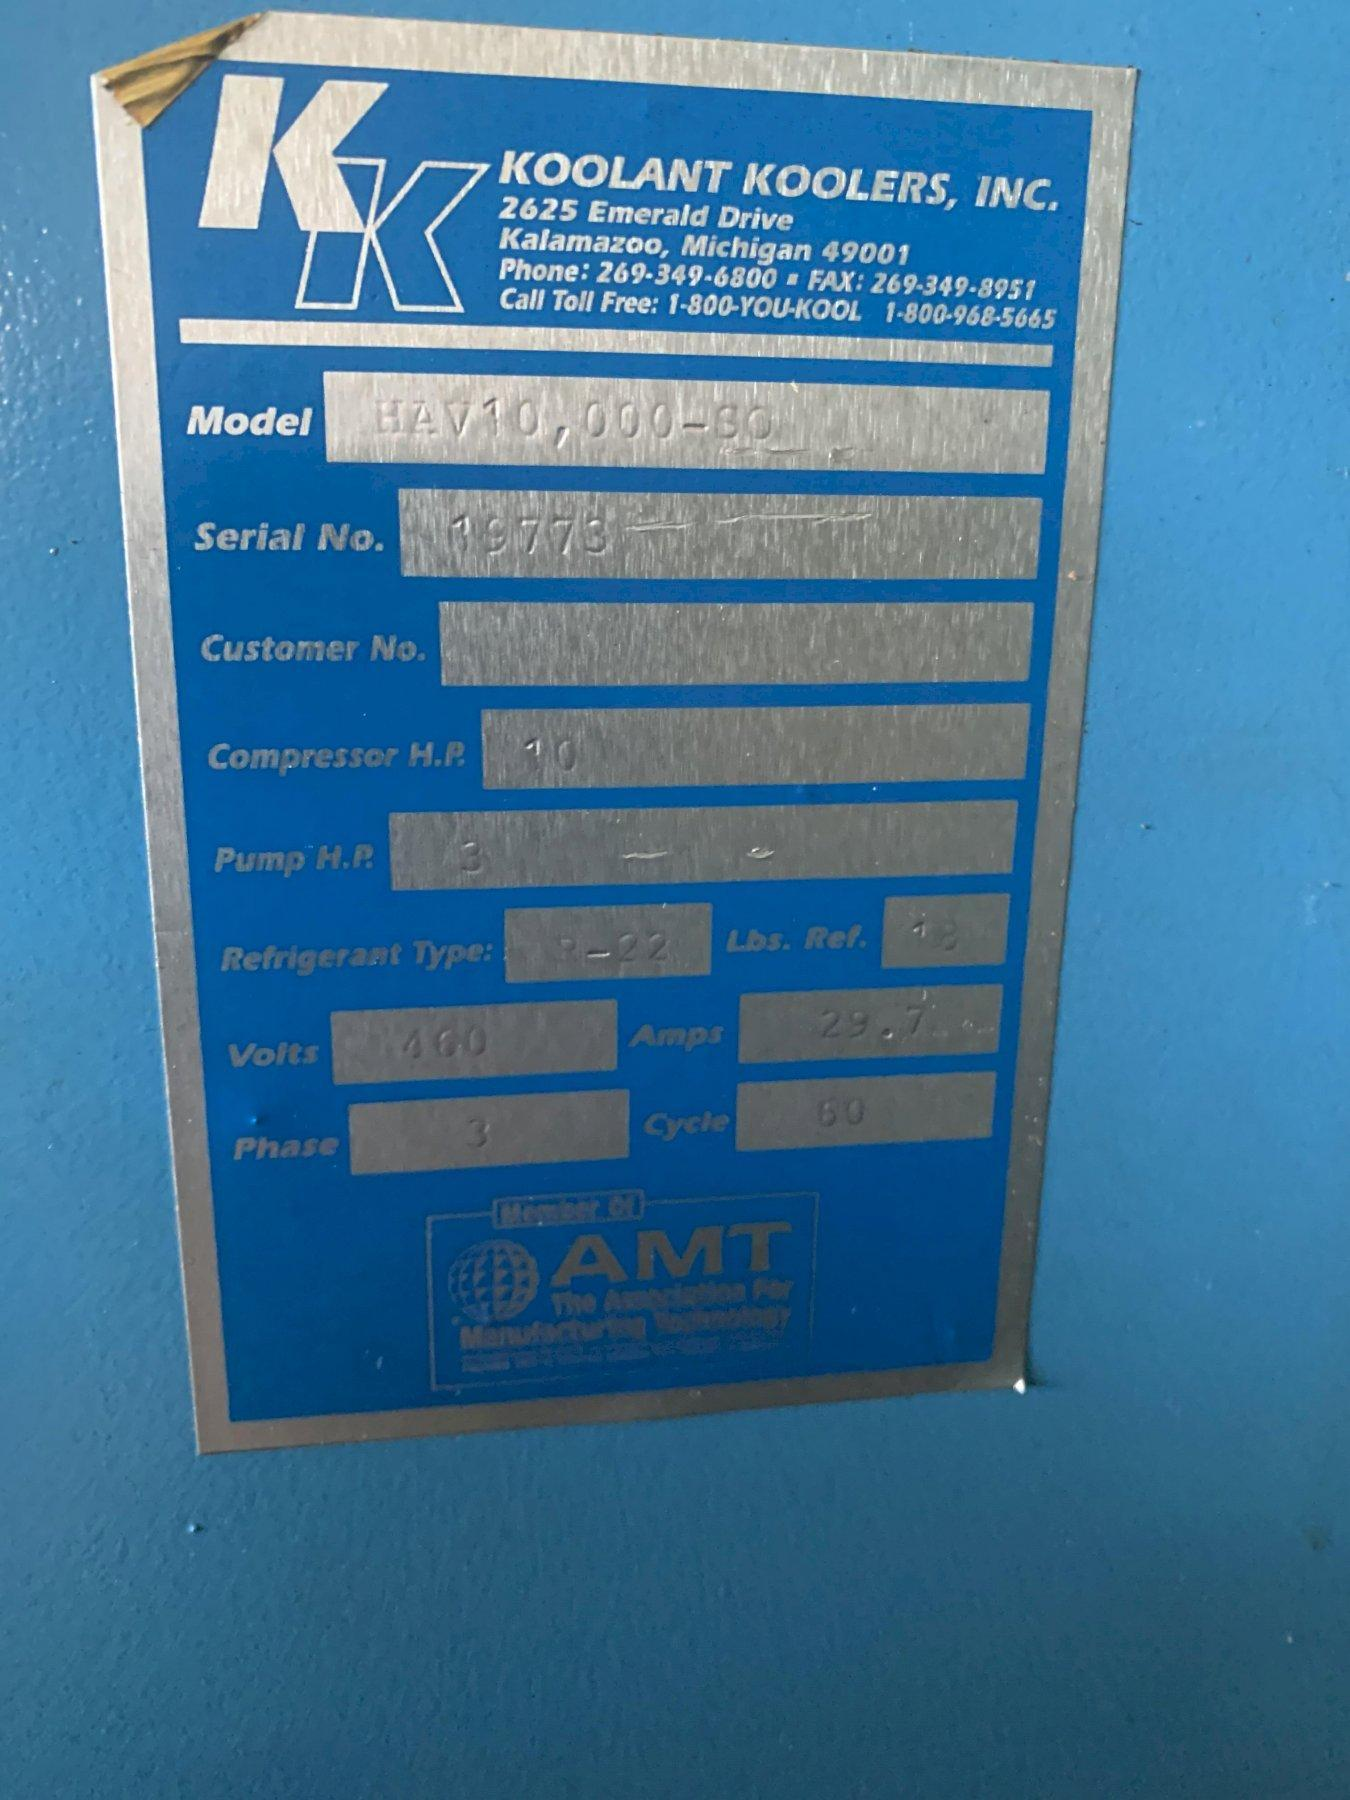 "2"" X 72"" TECHNIDRILL MODEL 700-72-2-0-25-1 BTA EJECTOR COUNTER ROTATING GUN DRILL: STOCK #12113"